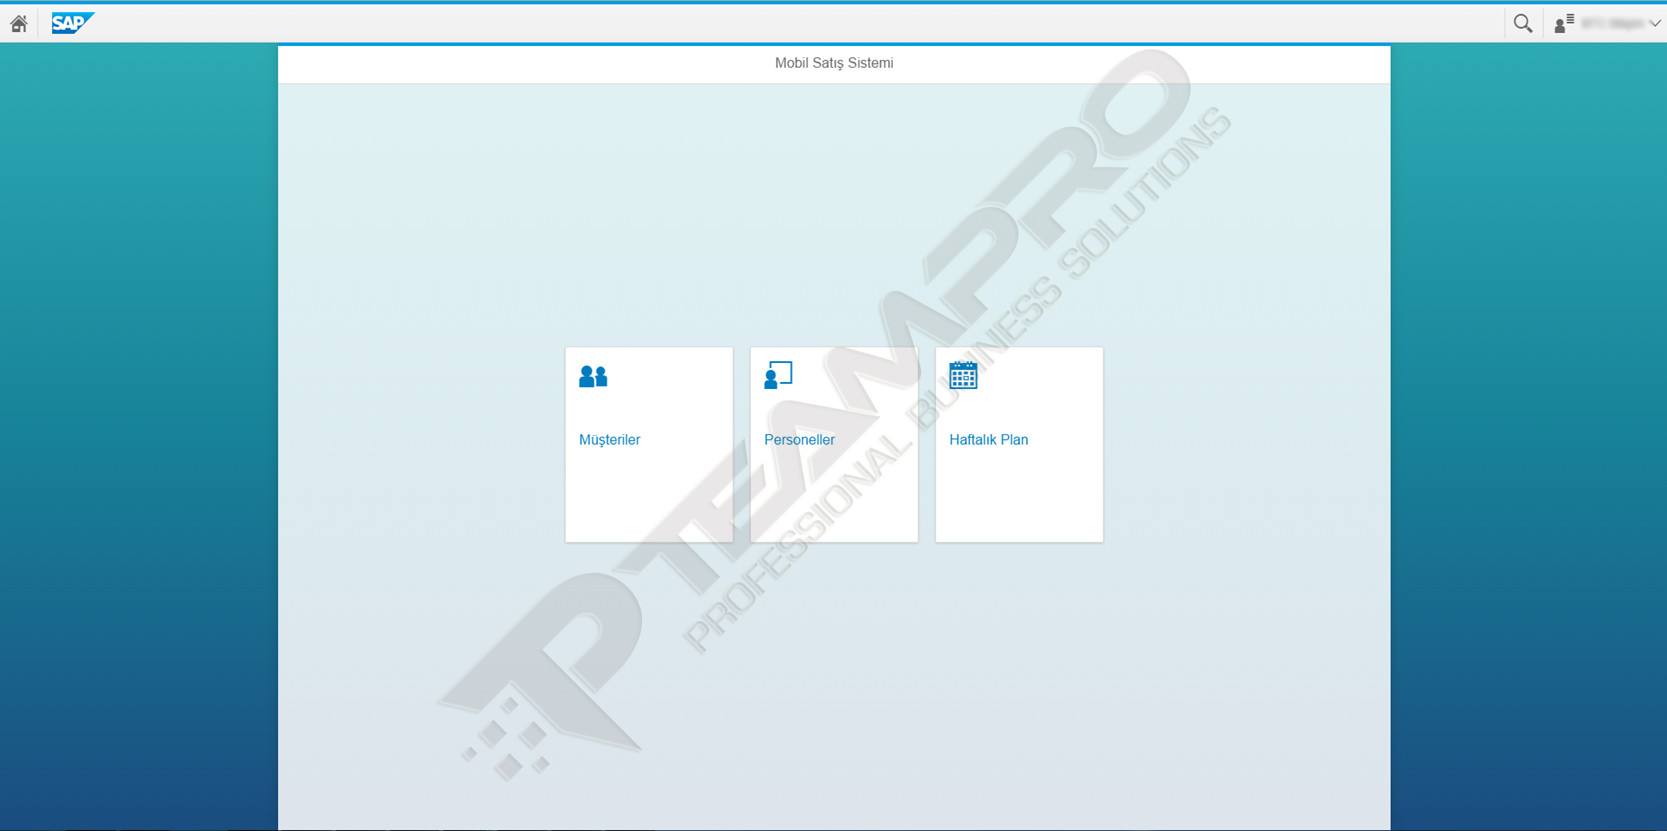 SAP Fiori | Mobil Satış Sistemi